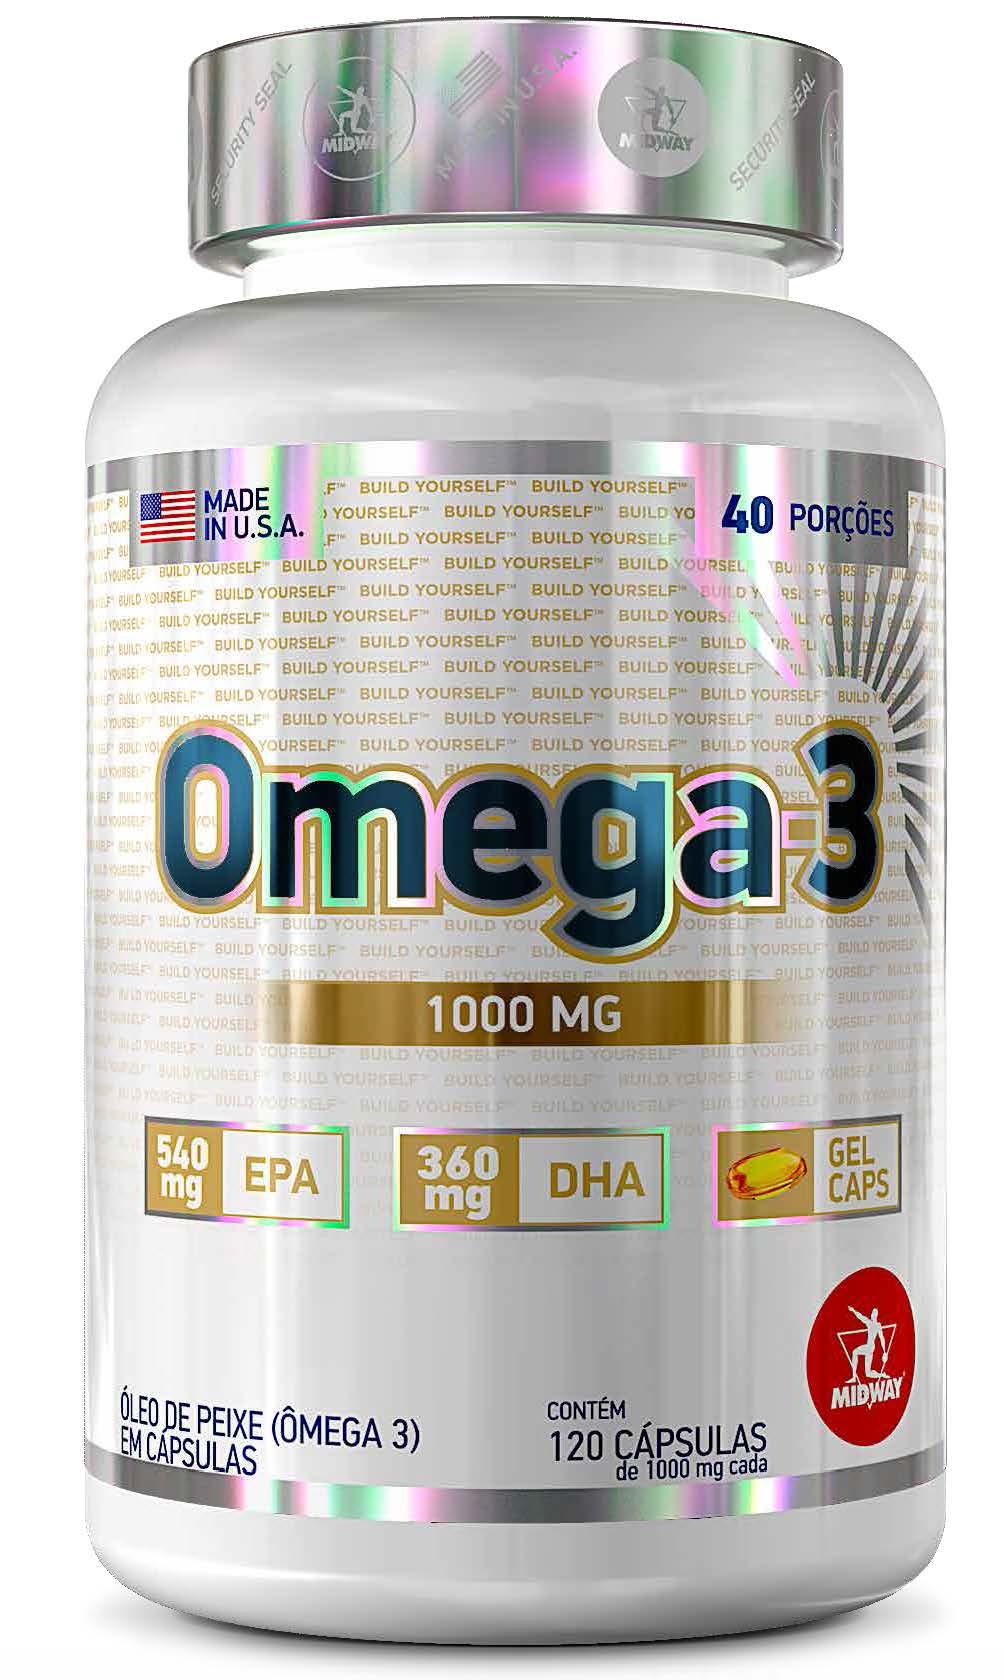 Kit +Saúde: Vitamina C 60 Caps + L-Glutamina 280g + Omega 3 120 Caps + Coqueteleira